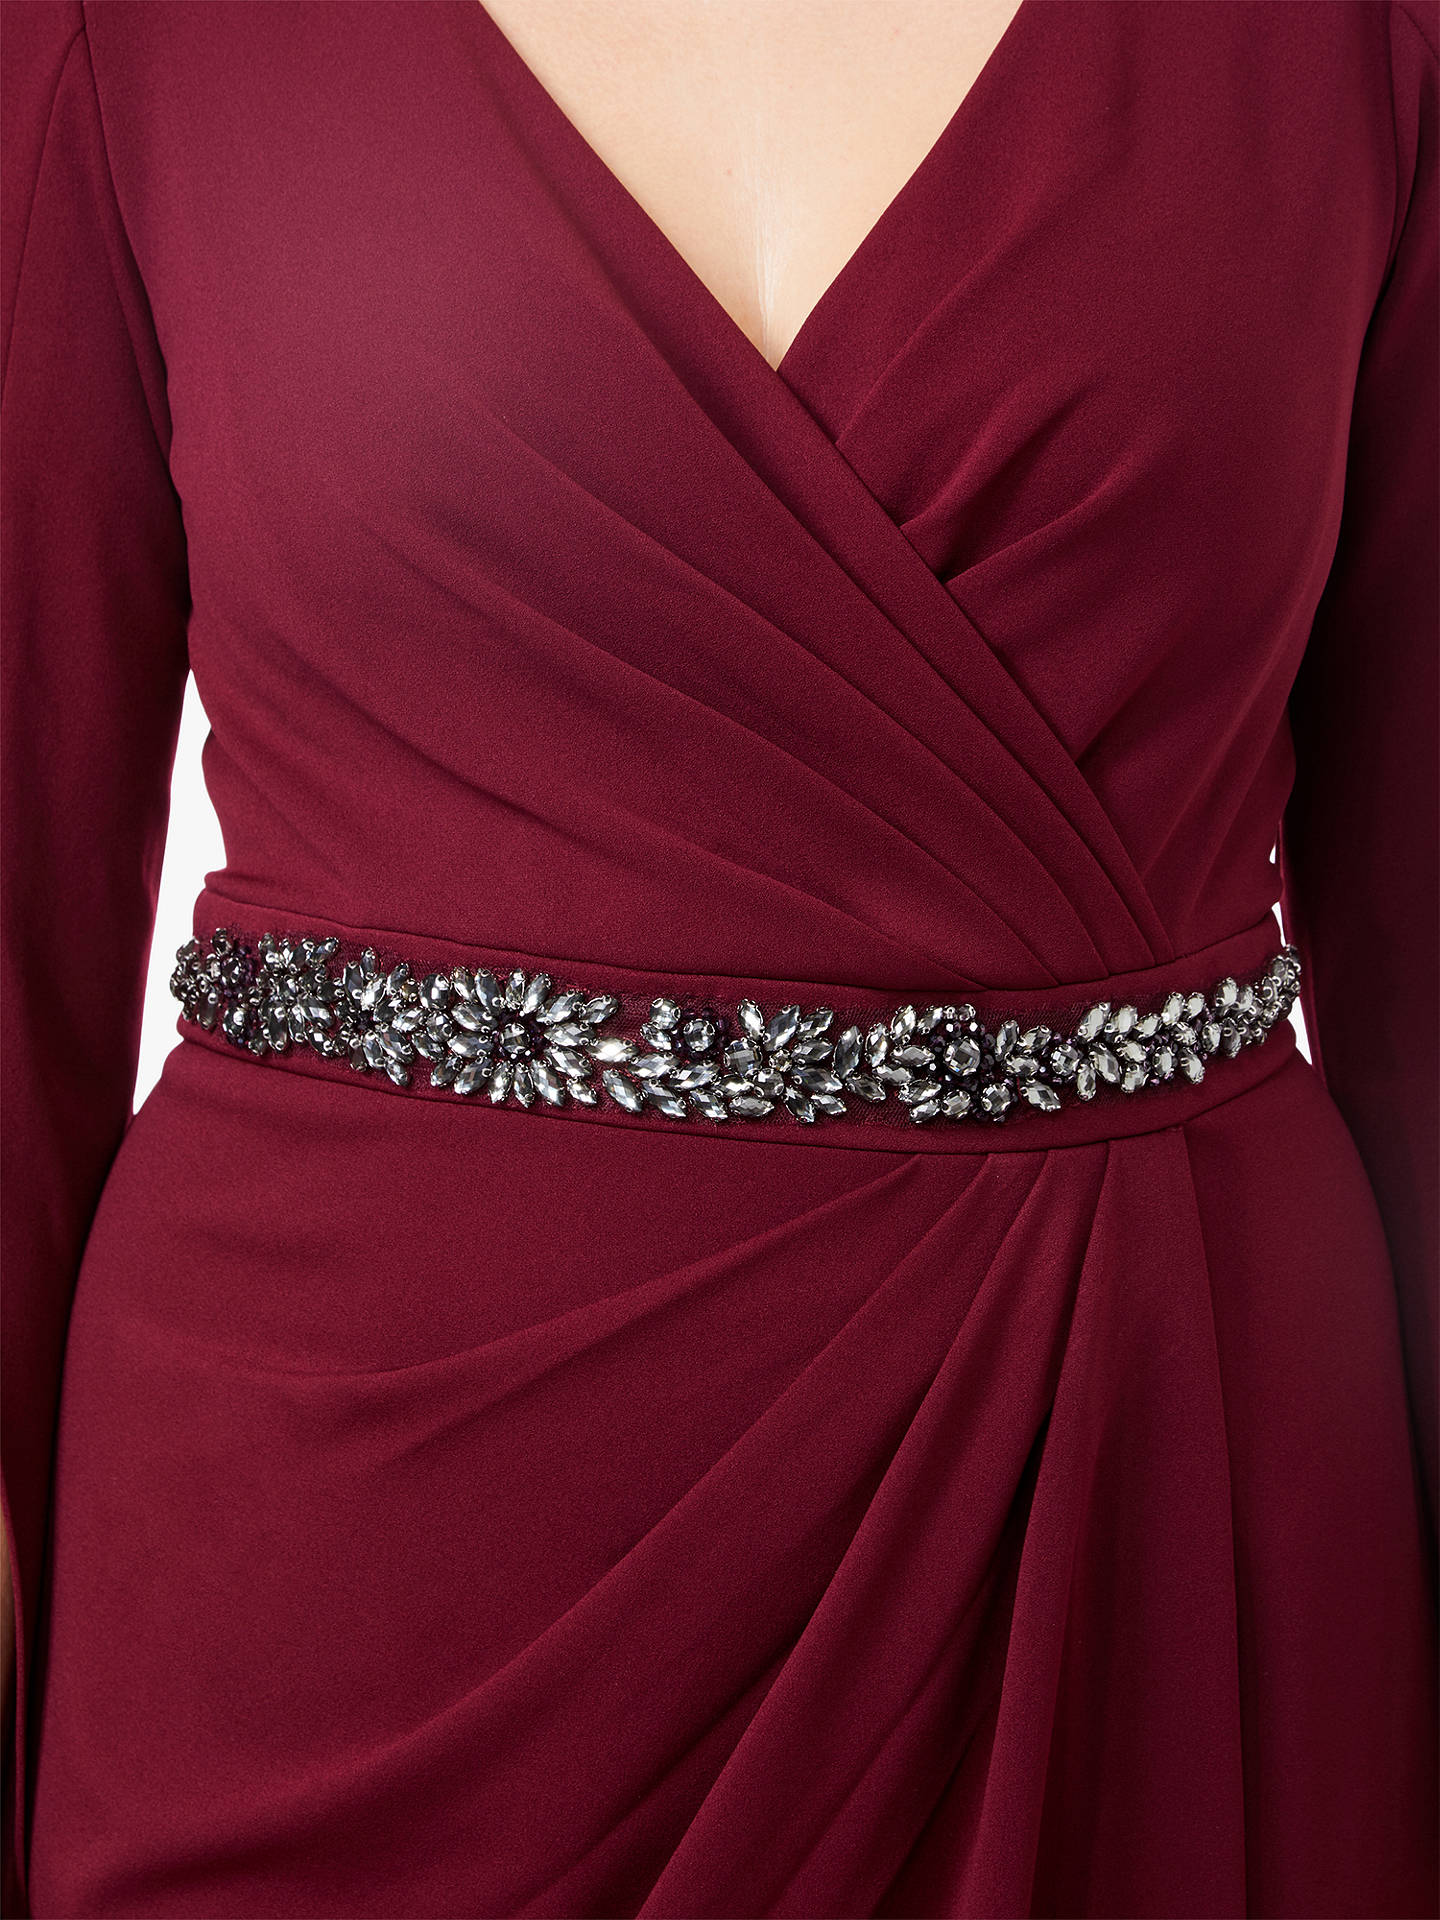 352ac126845 ... BuyAdrianna Papell Plus Size Long Split Sleeve Evening Dress